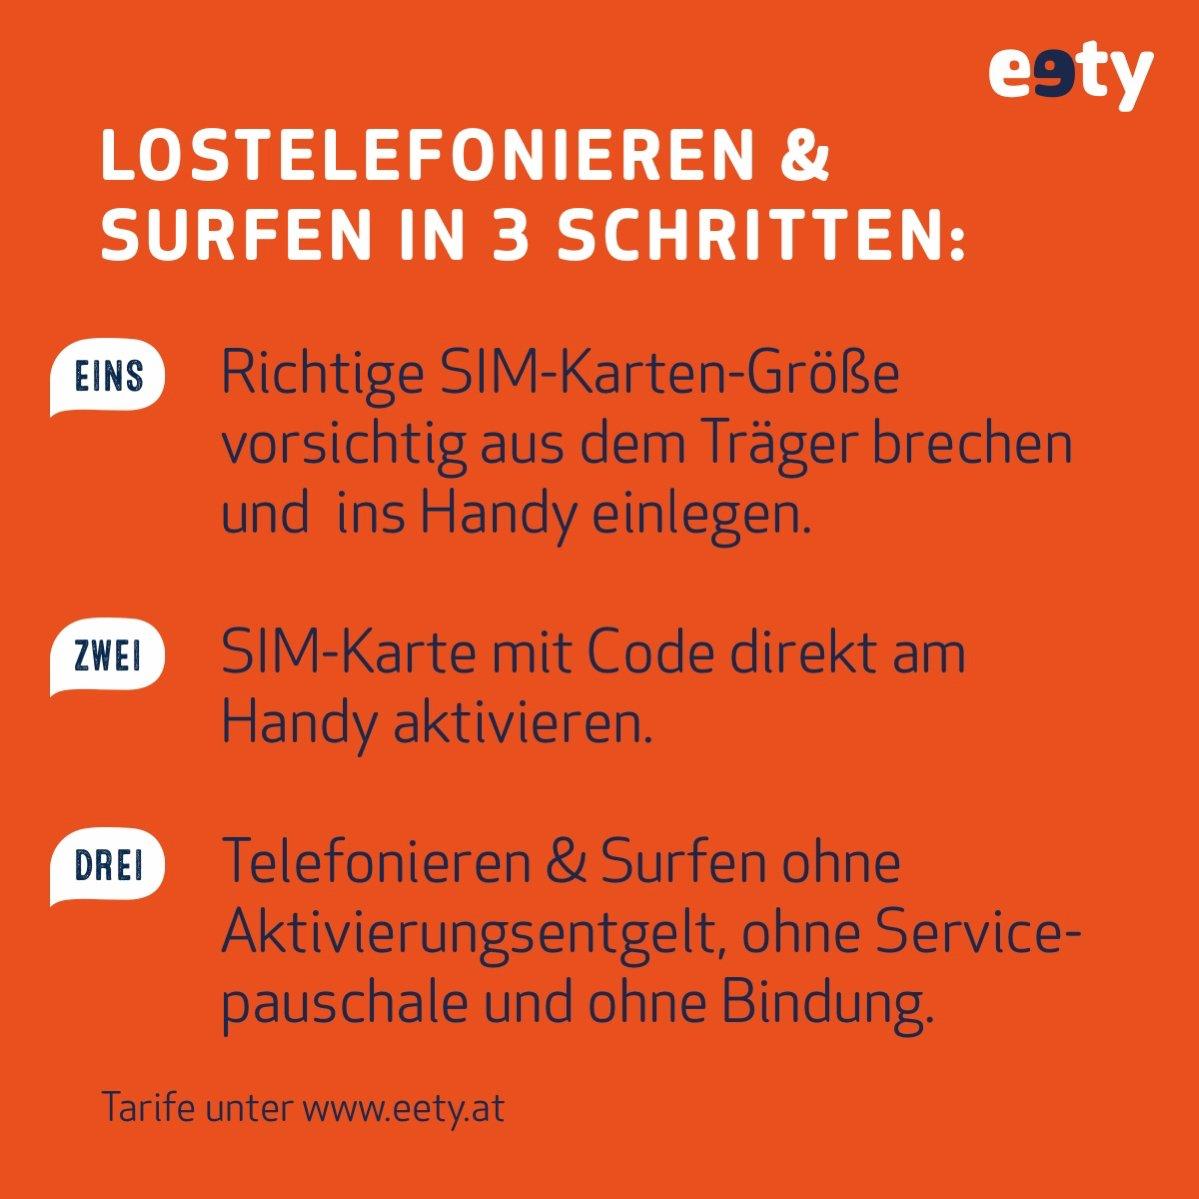 Eety Smartphone Tarif Top österreich Normal Amazonde Elektronik